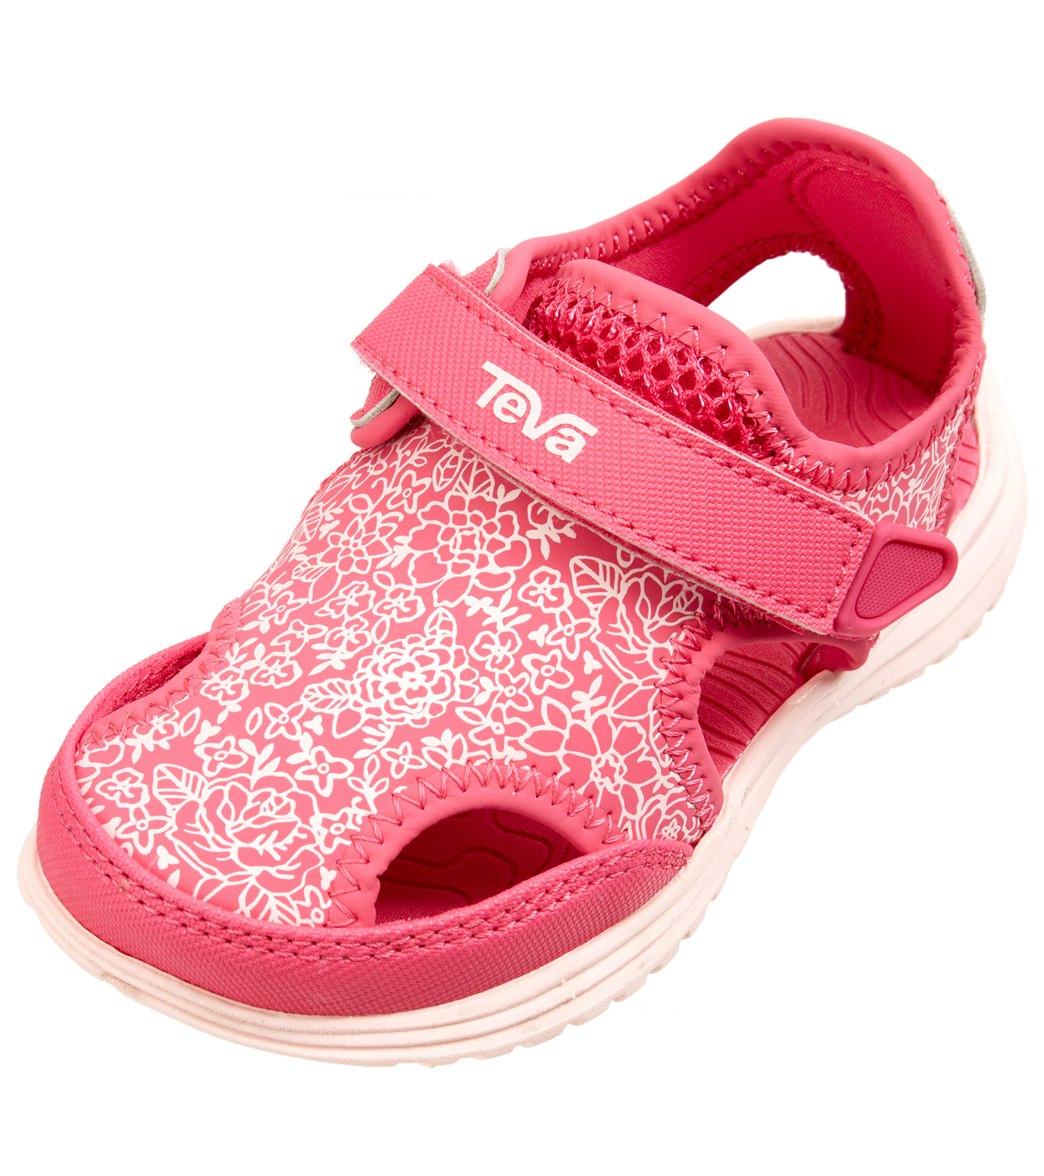 6a9de6d3e Teva Toddler s Tidepool Sport Water Shoe at SwimOutlet.com